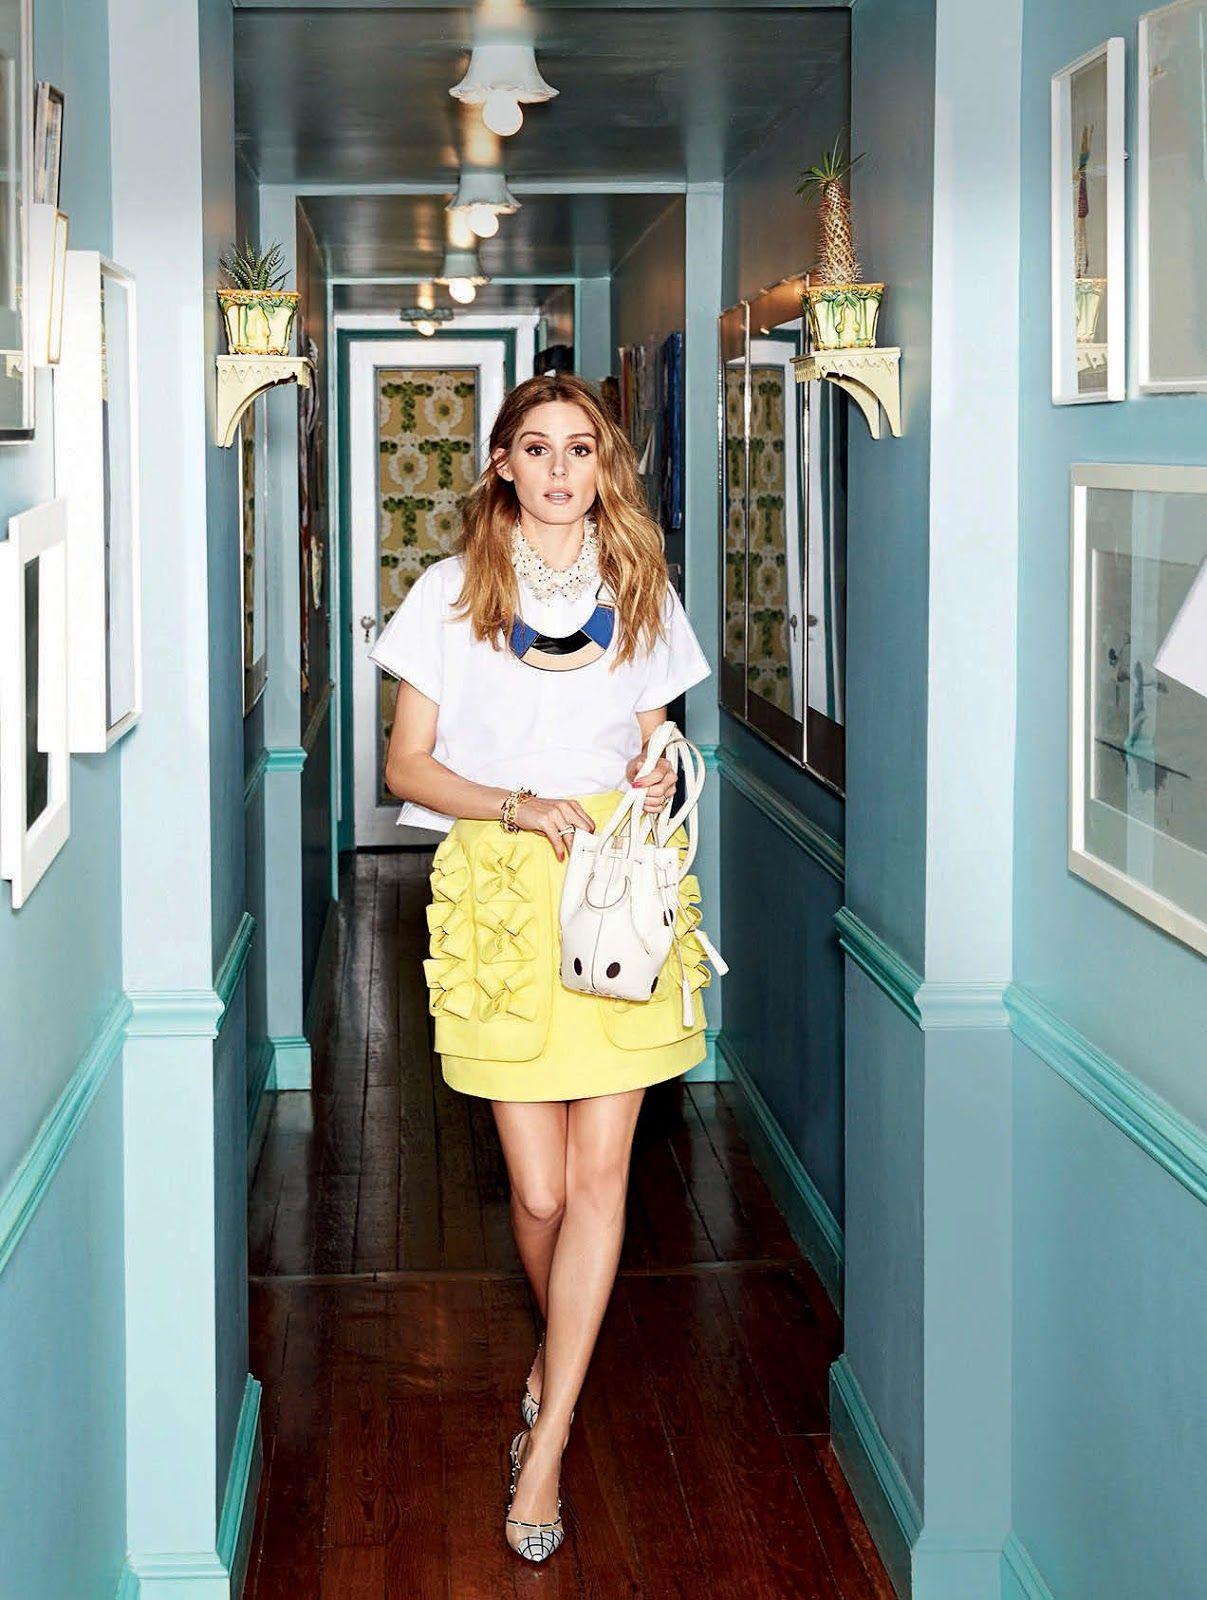 Top, skirt, Delpozo. Shoes, Bionda Castana. Bag, Tod's. Necklace, Marni. Bracelet, Lele Sadoughi